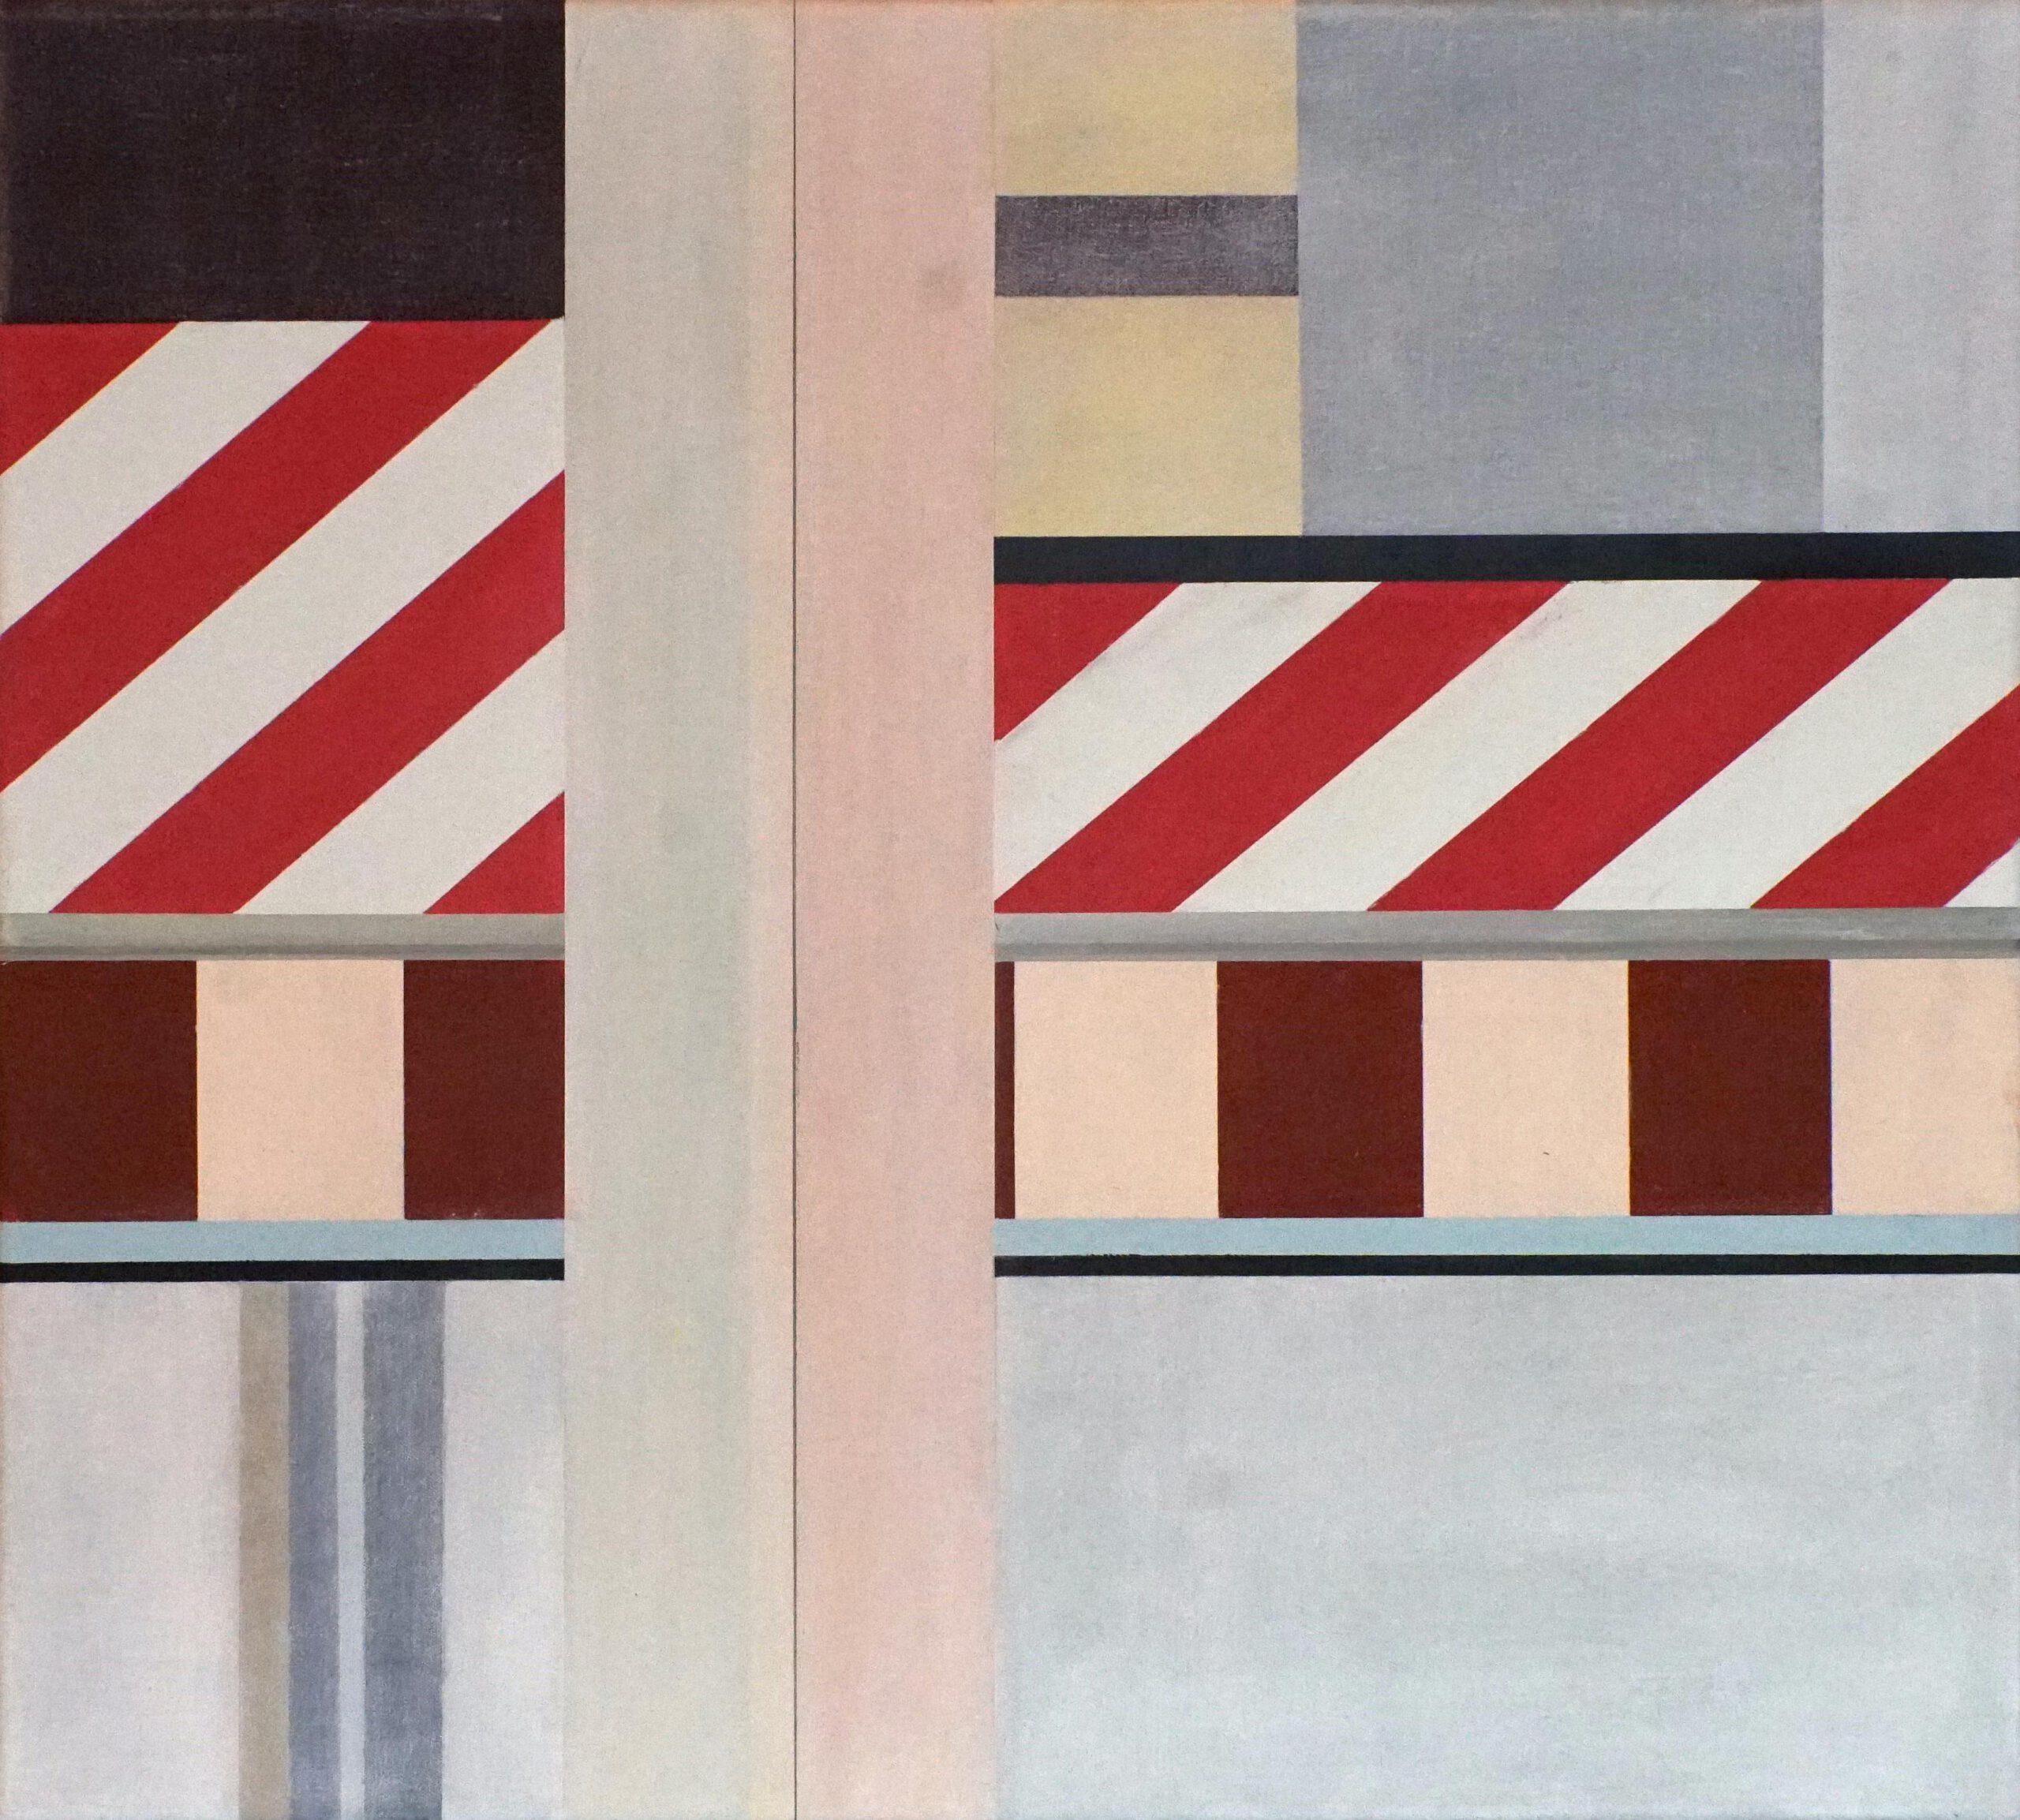 Chinatown VII, 2020, 45 x 50 cm, Öl/Lw, Oil on Canvas